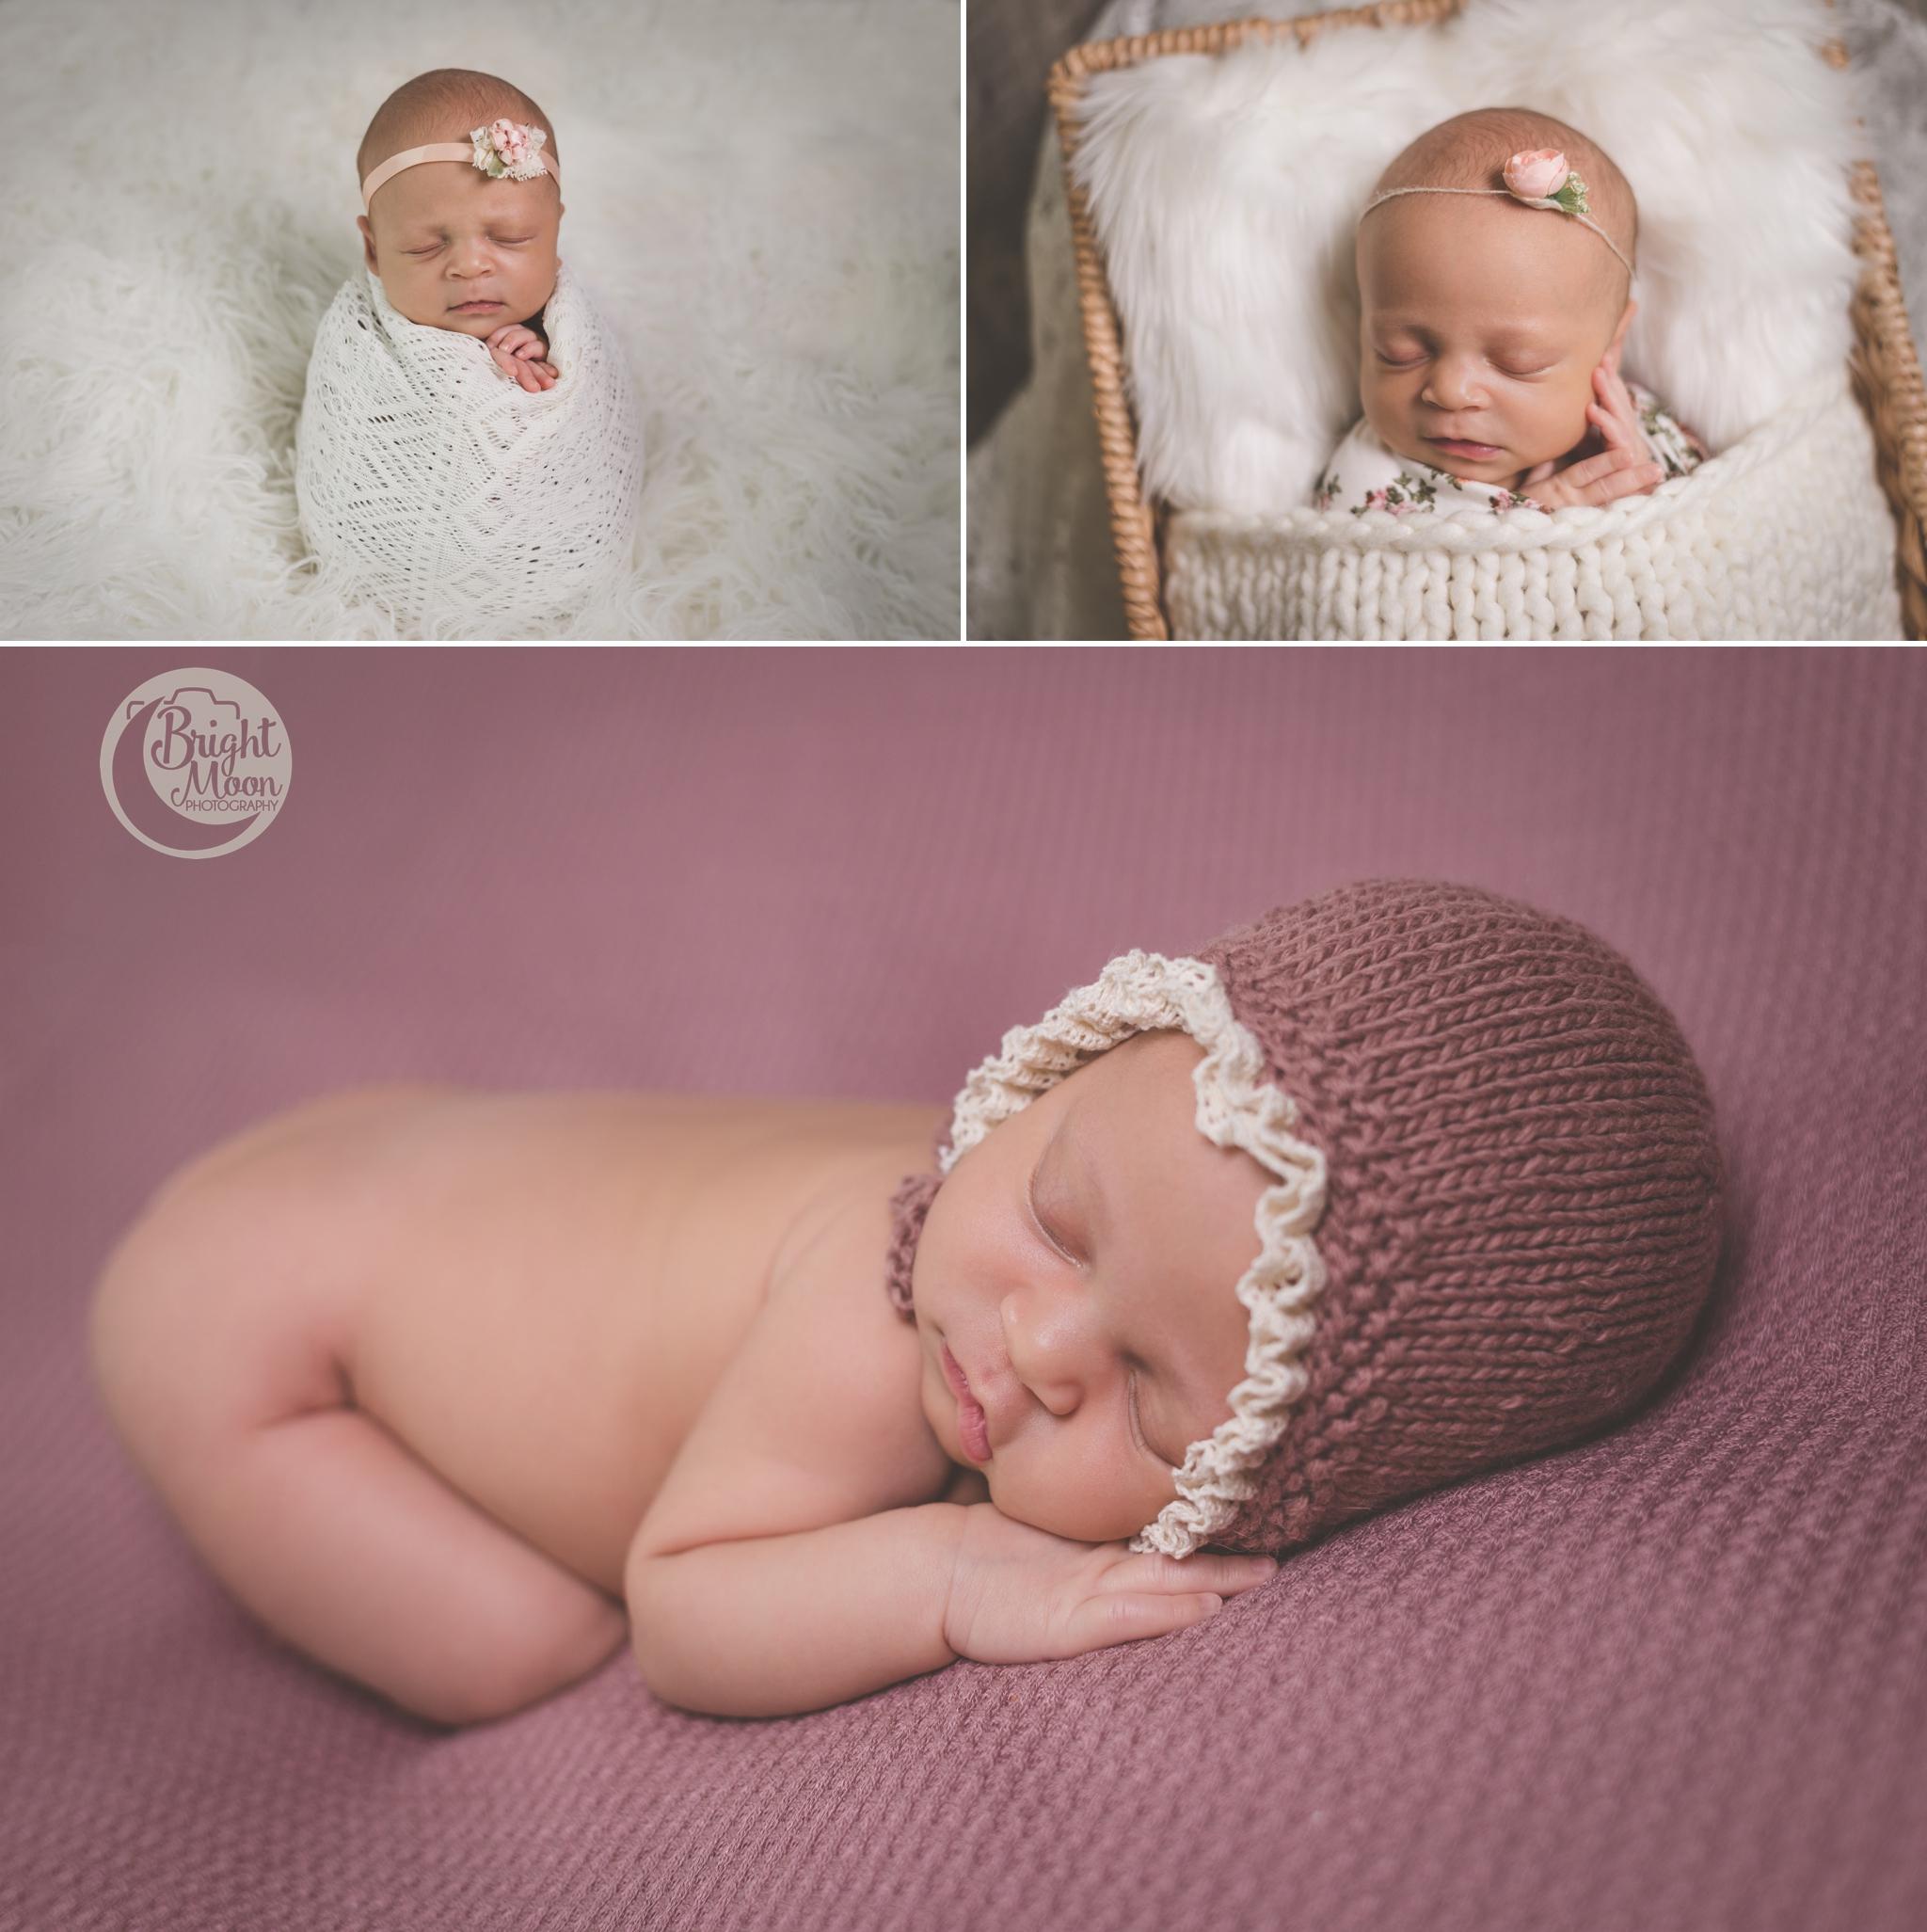 Bright Moon Photography | Newborn Baby girl Photographer